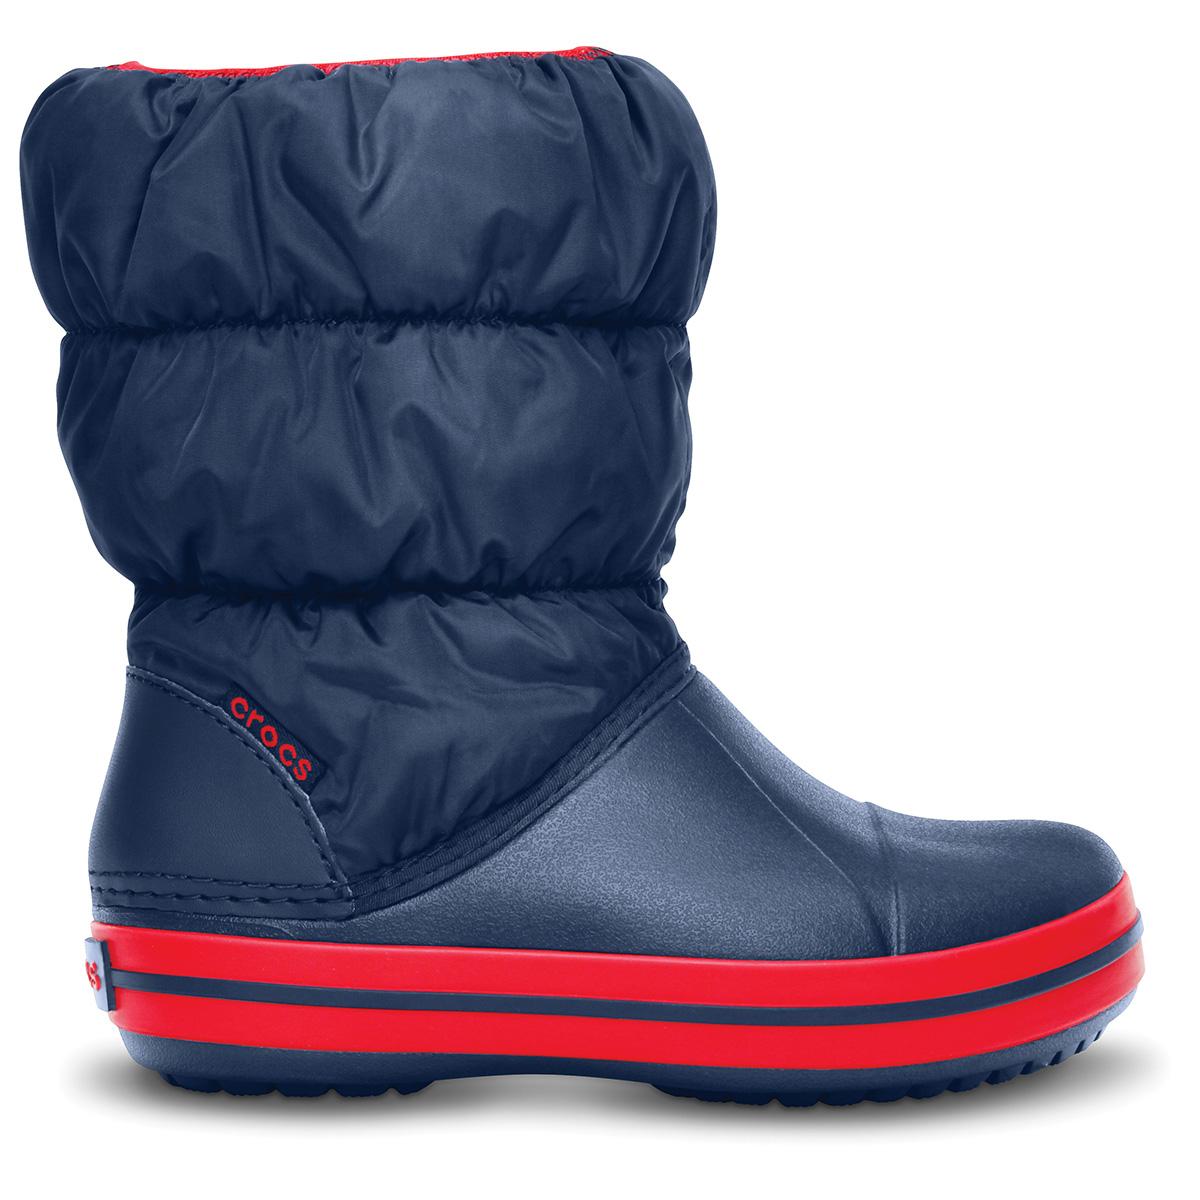 Winter Puff Boot Kids - Lacivert/Kırmızı